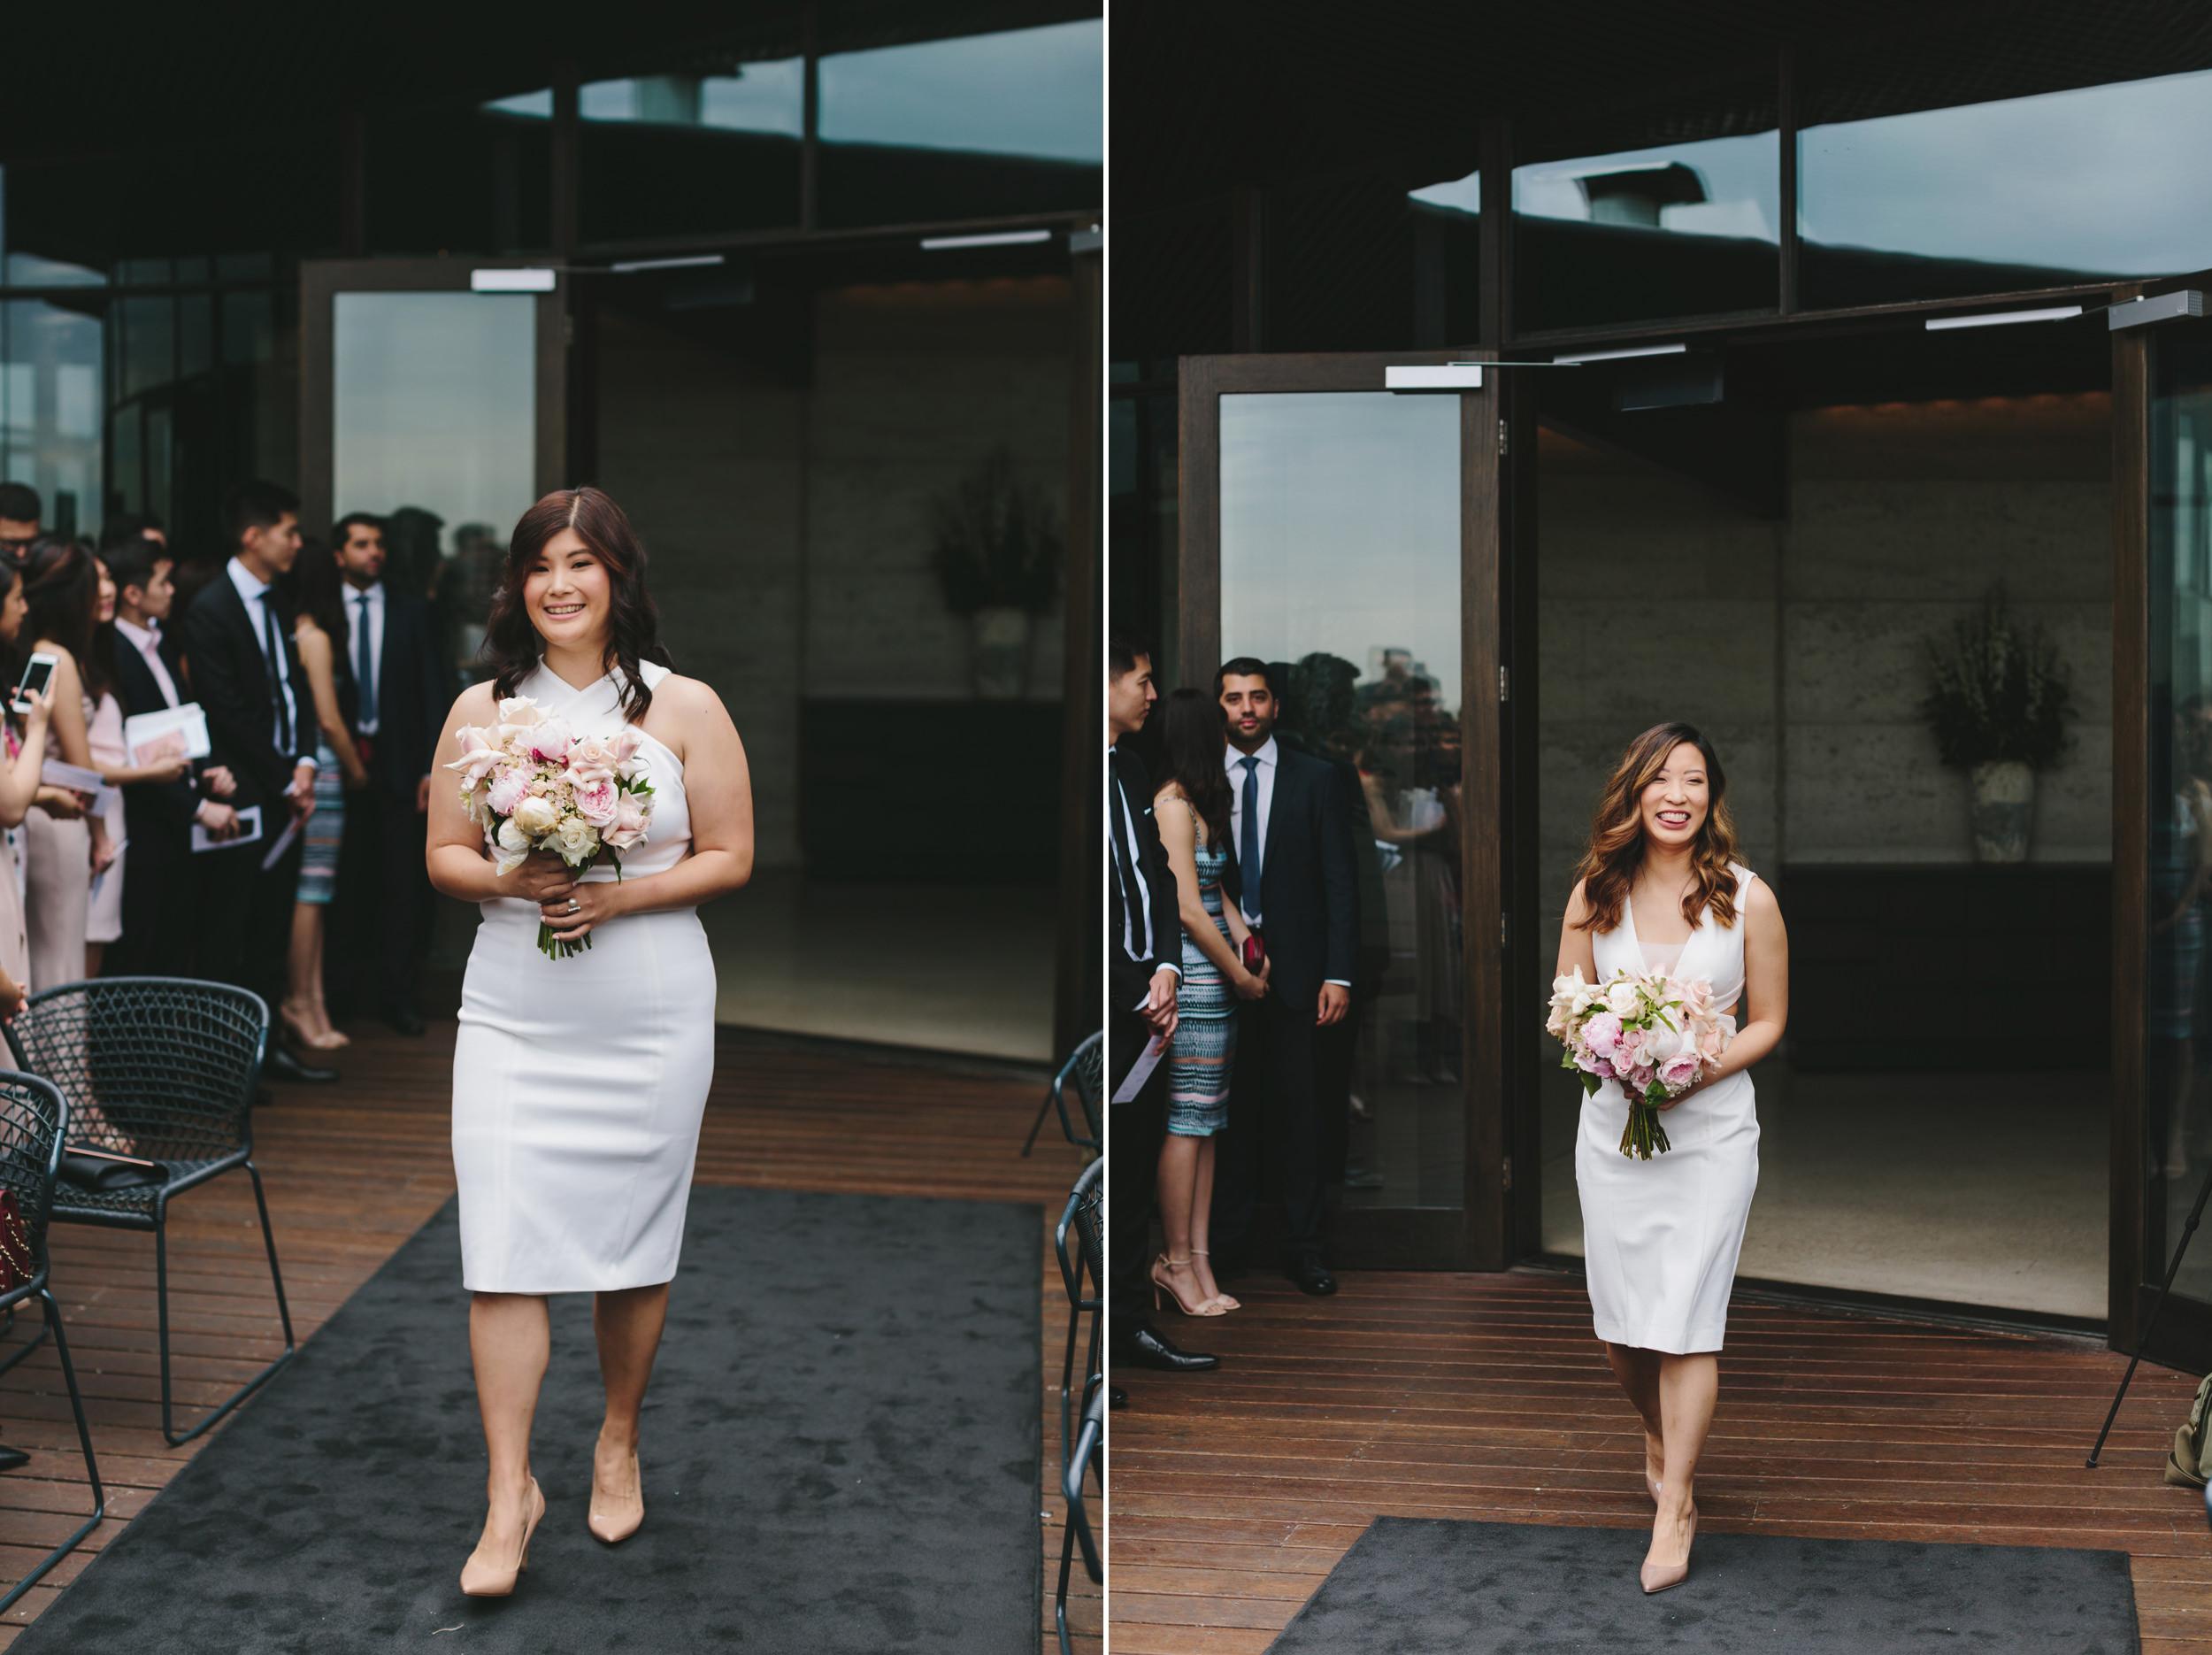 Melbourne Winery Wedding Daryl & Adeline 22.JPG